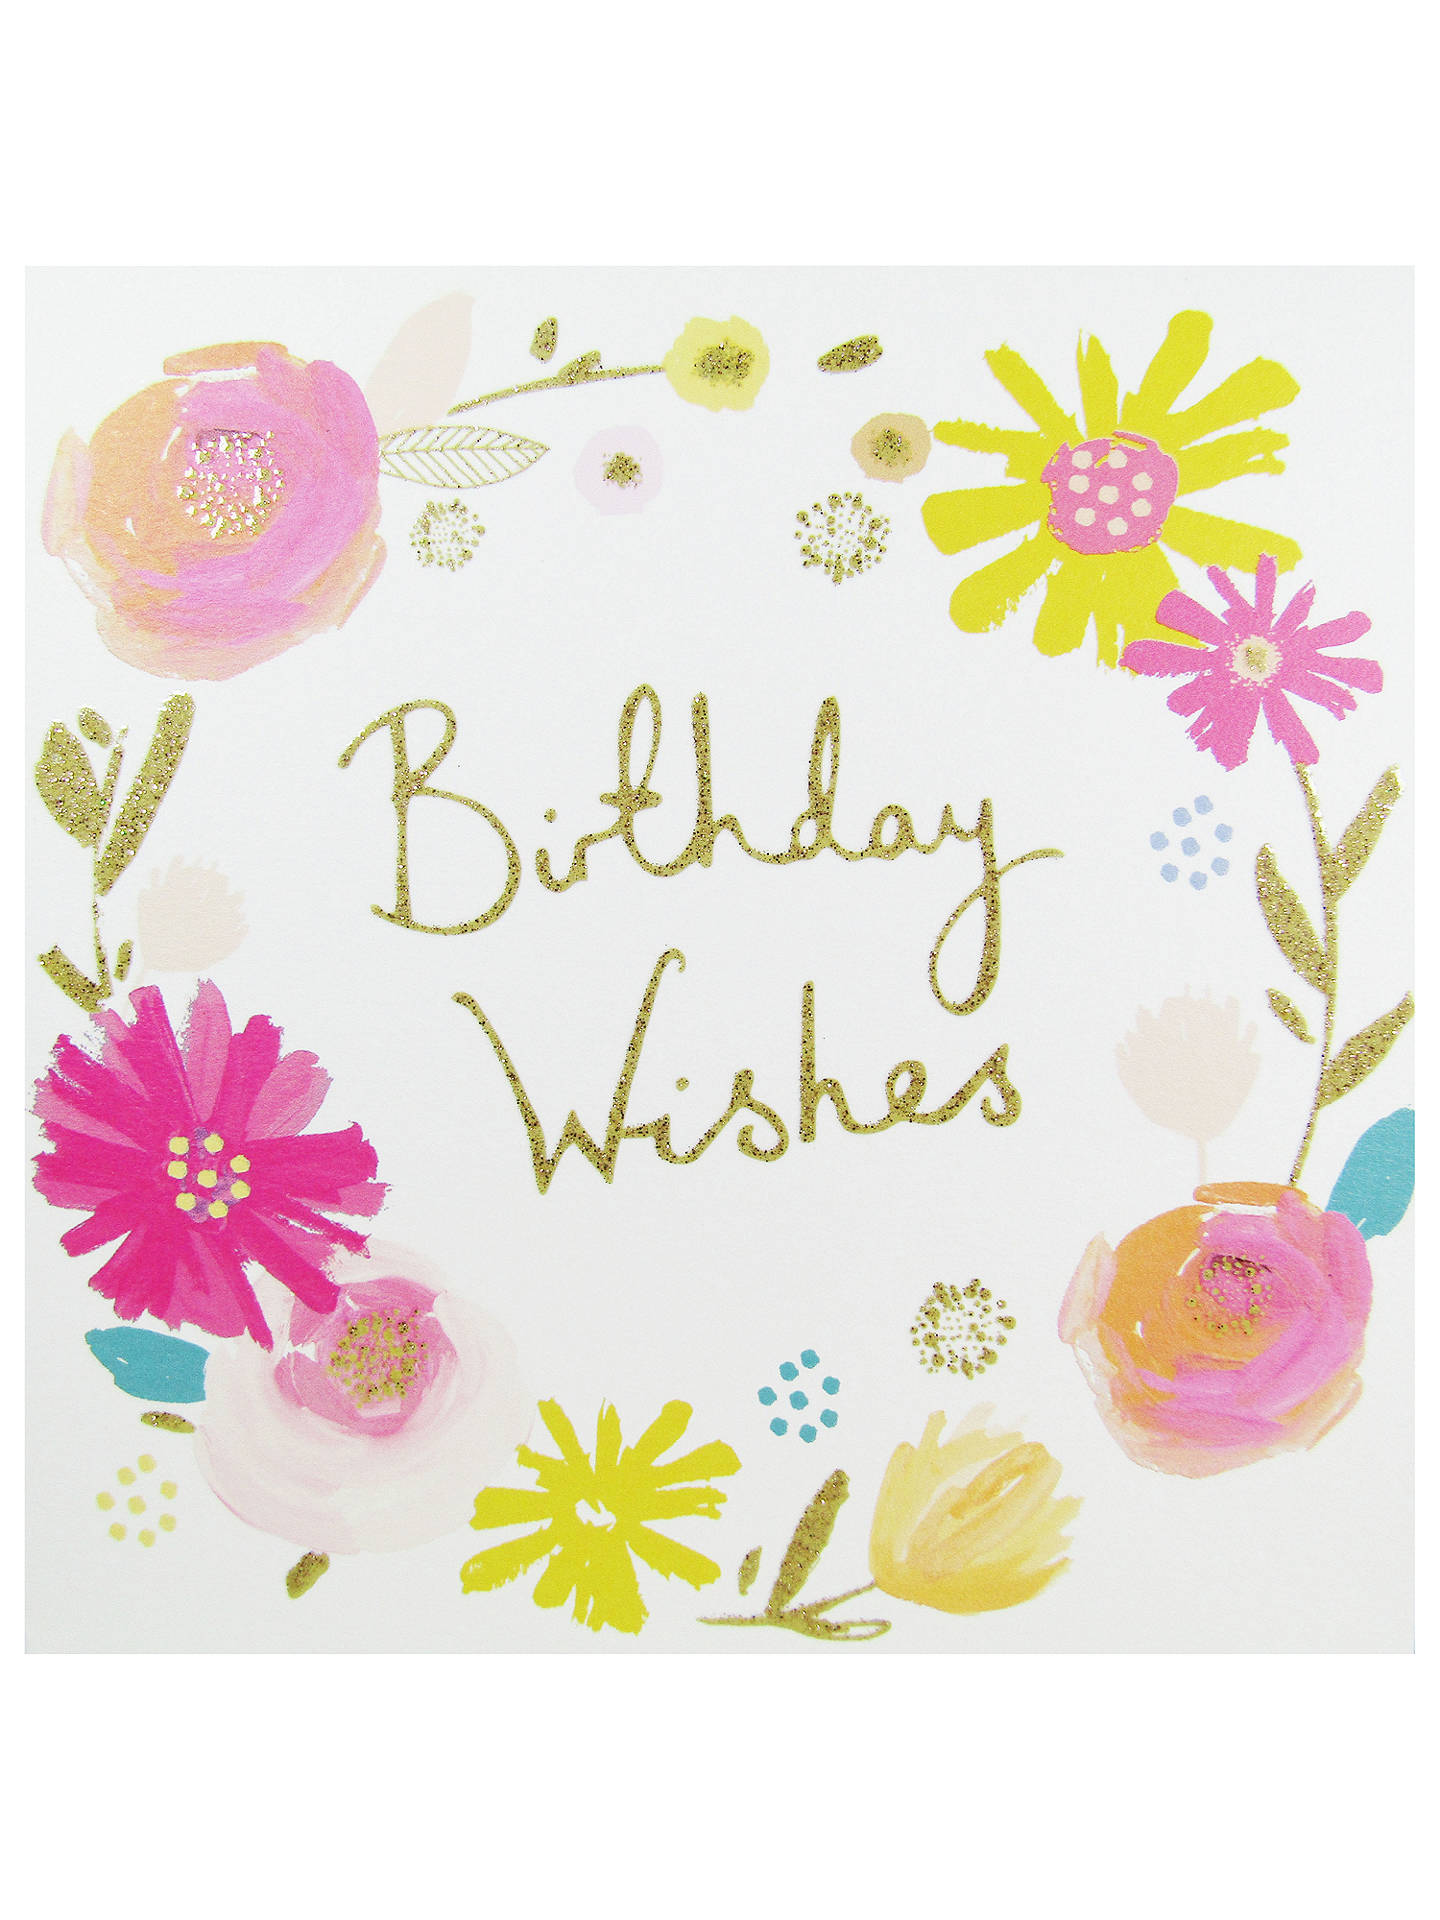 Woodmansterne Birthday Wishes Greeting Card At John Lewis Partners